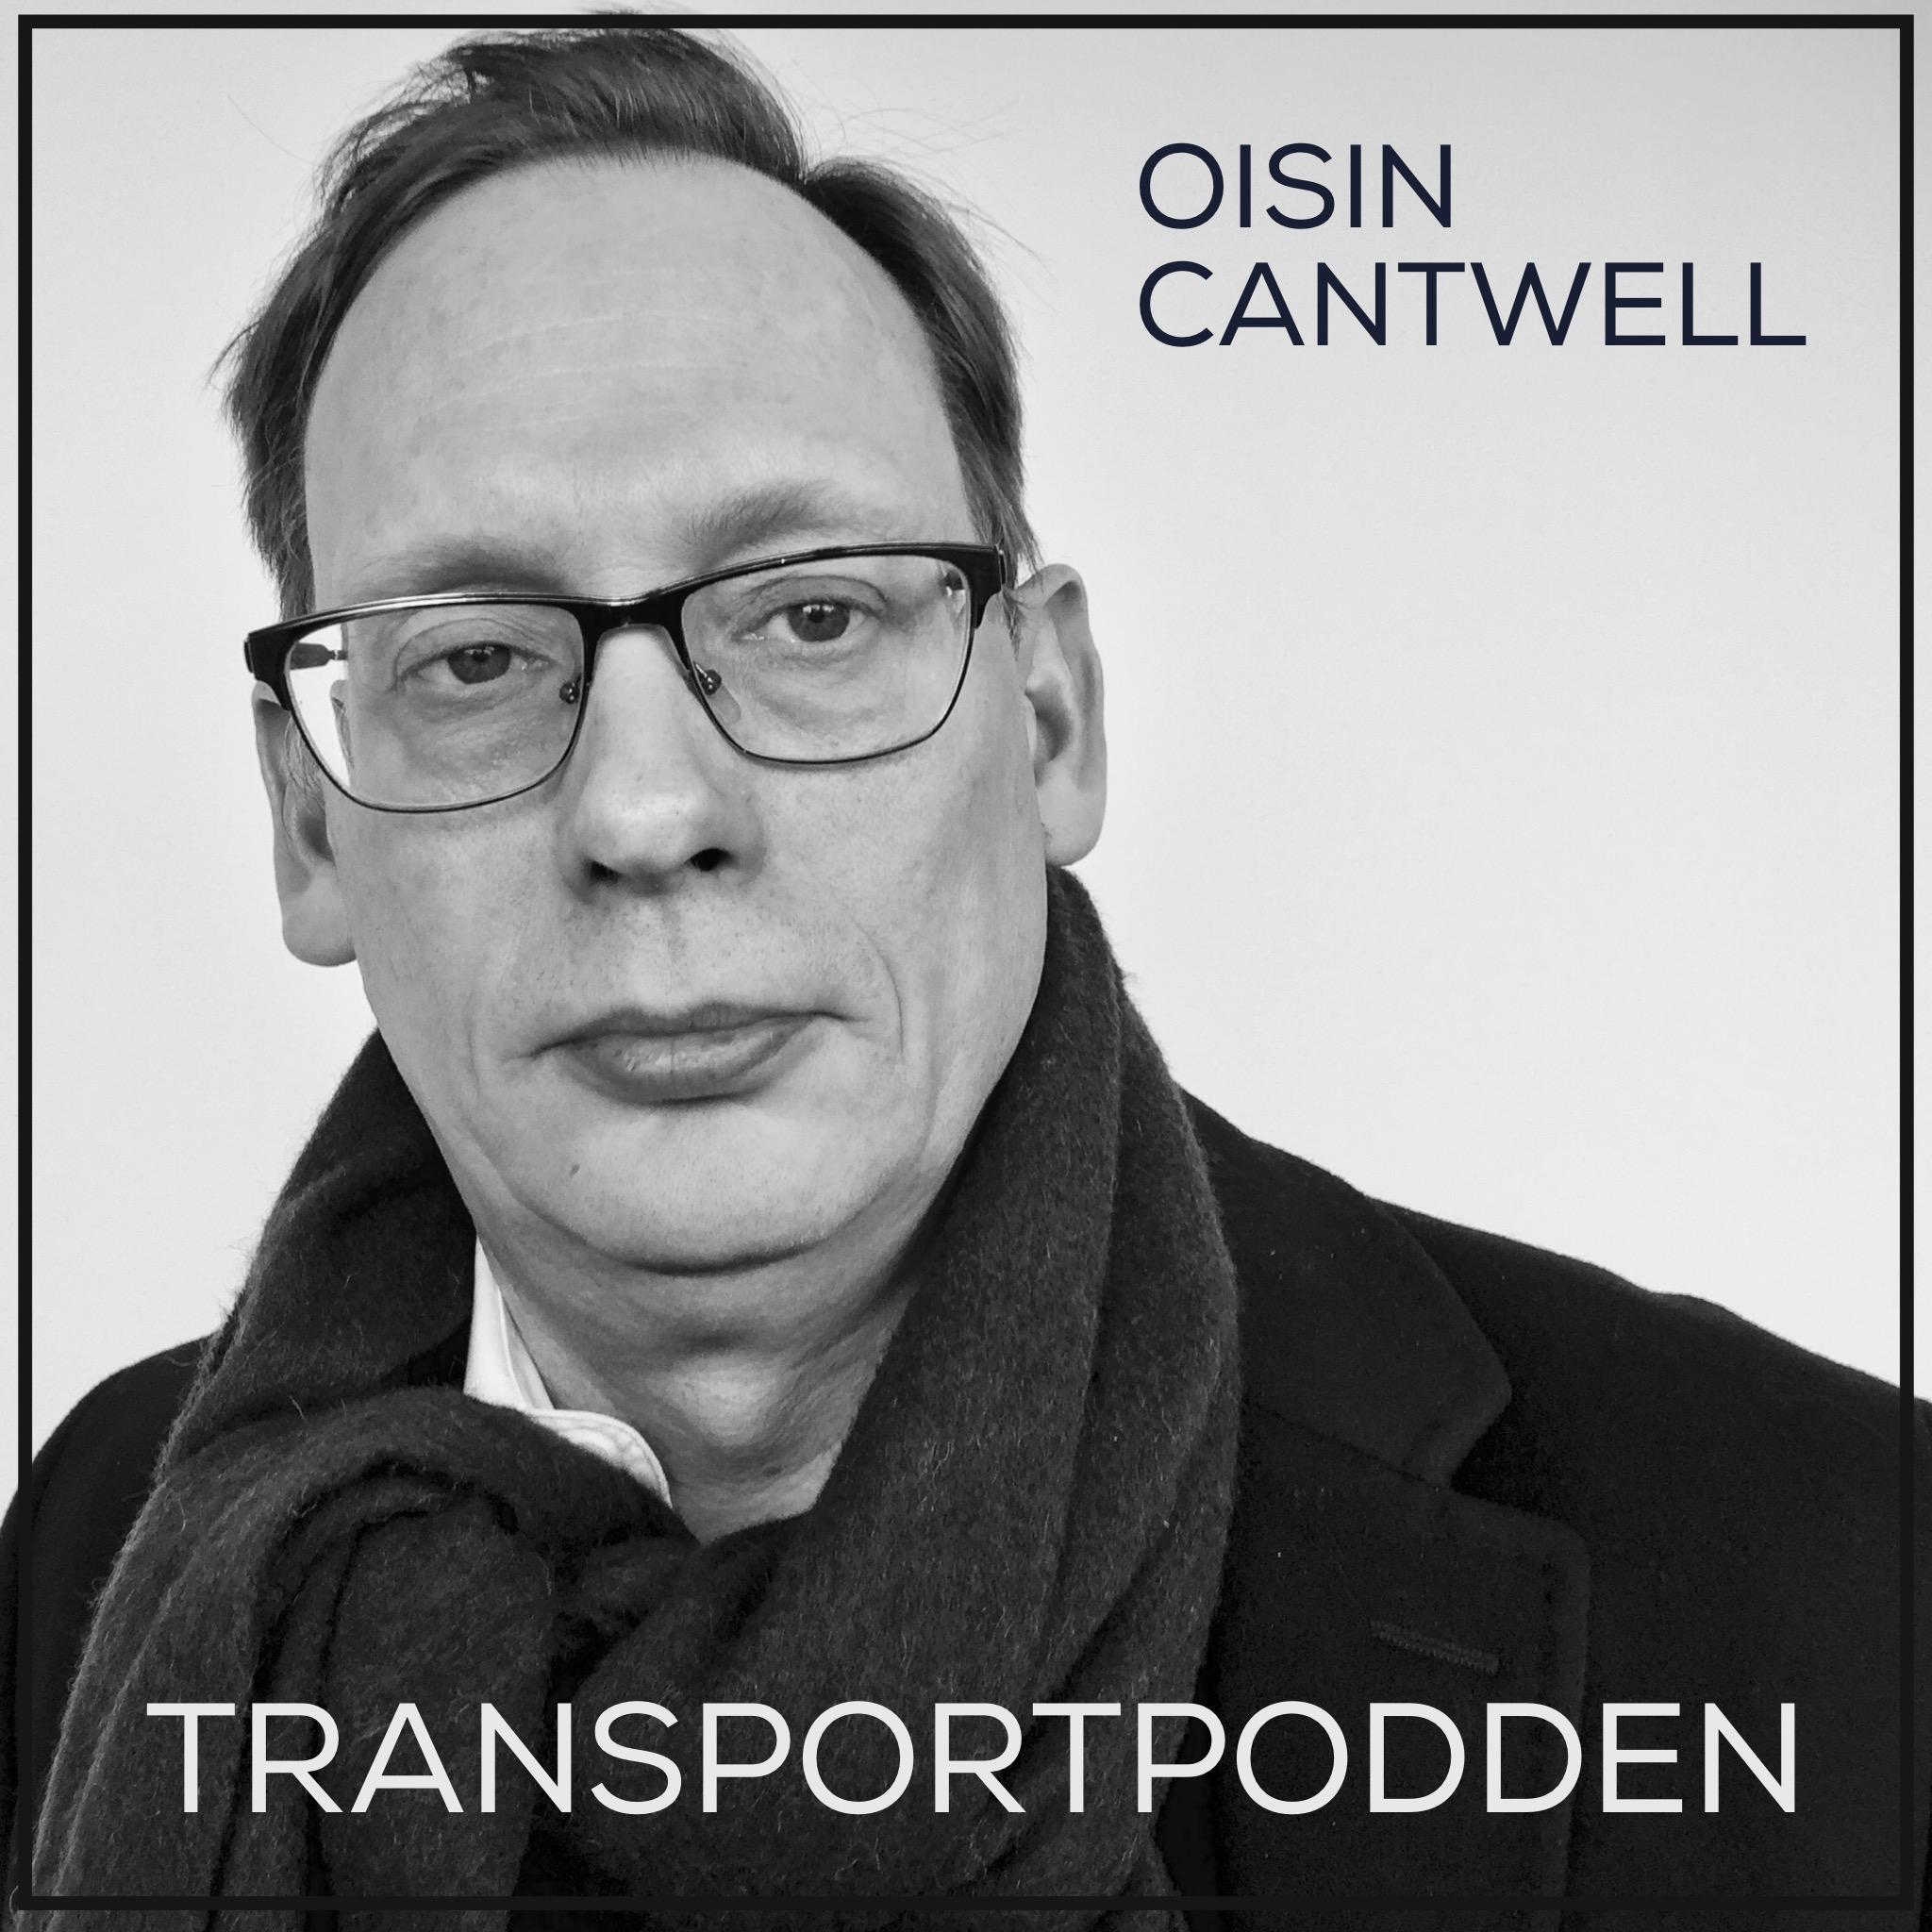 OISIN CANTWELL